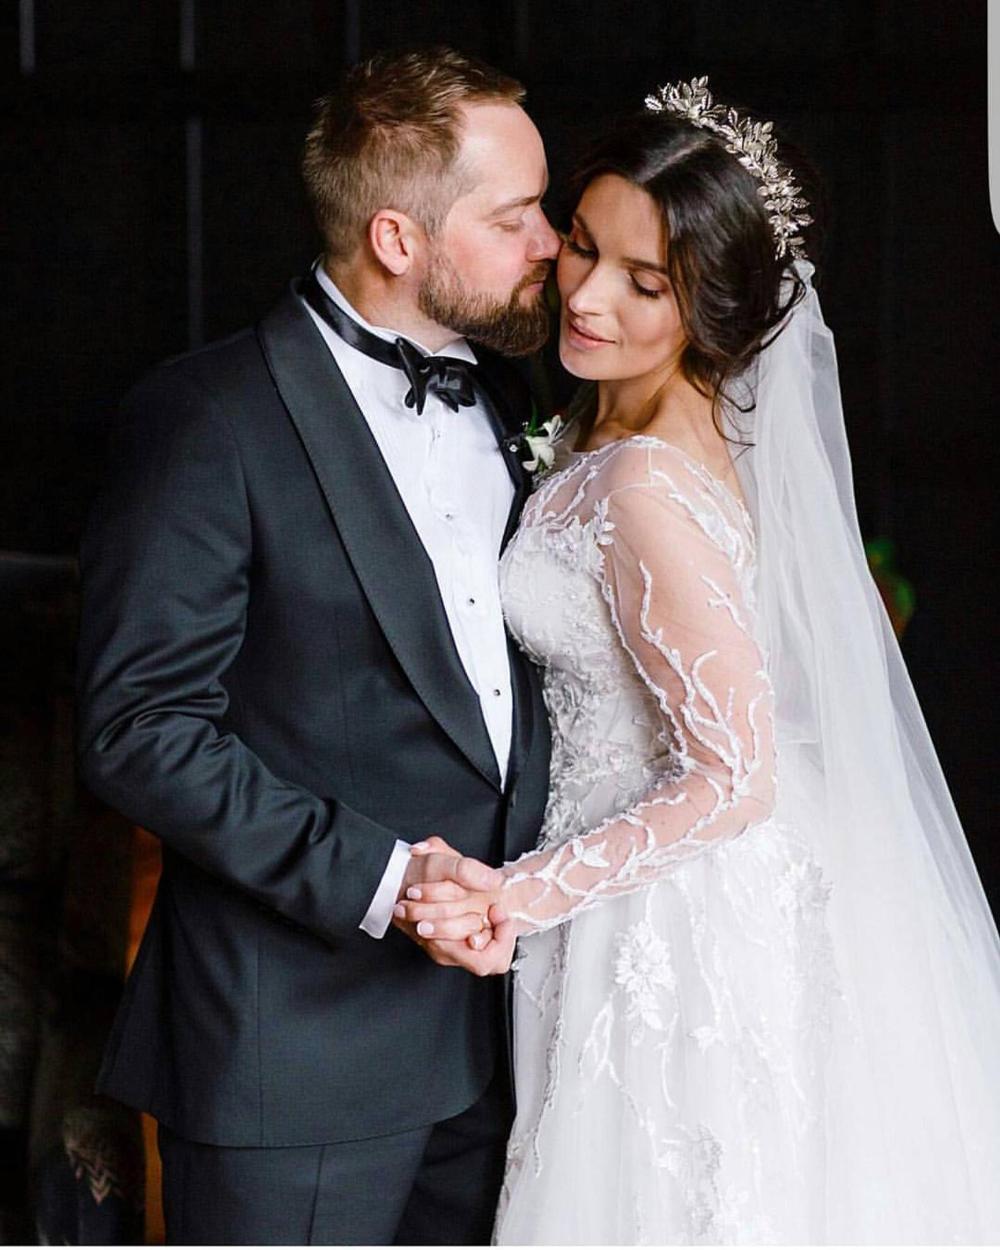 Pearl wedding crown, Greek Leaf Crown, floral Bridal Tiara, Bridal hairpiece, bridal headband, Silver Bridal Diadem, Pearl Wedding Tiara